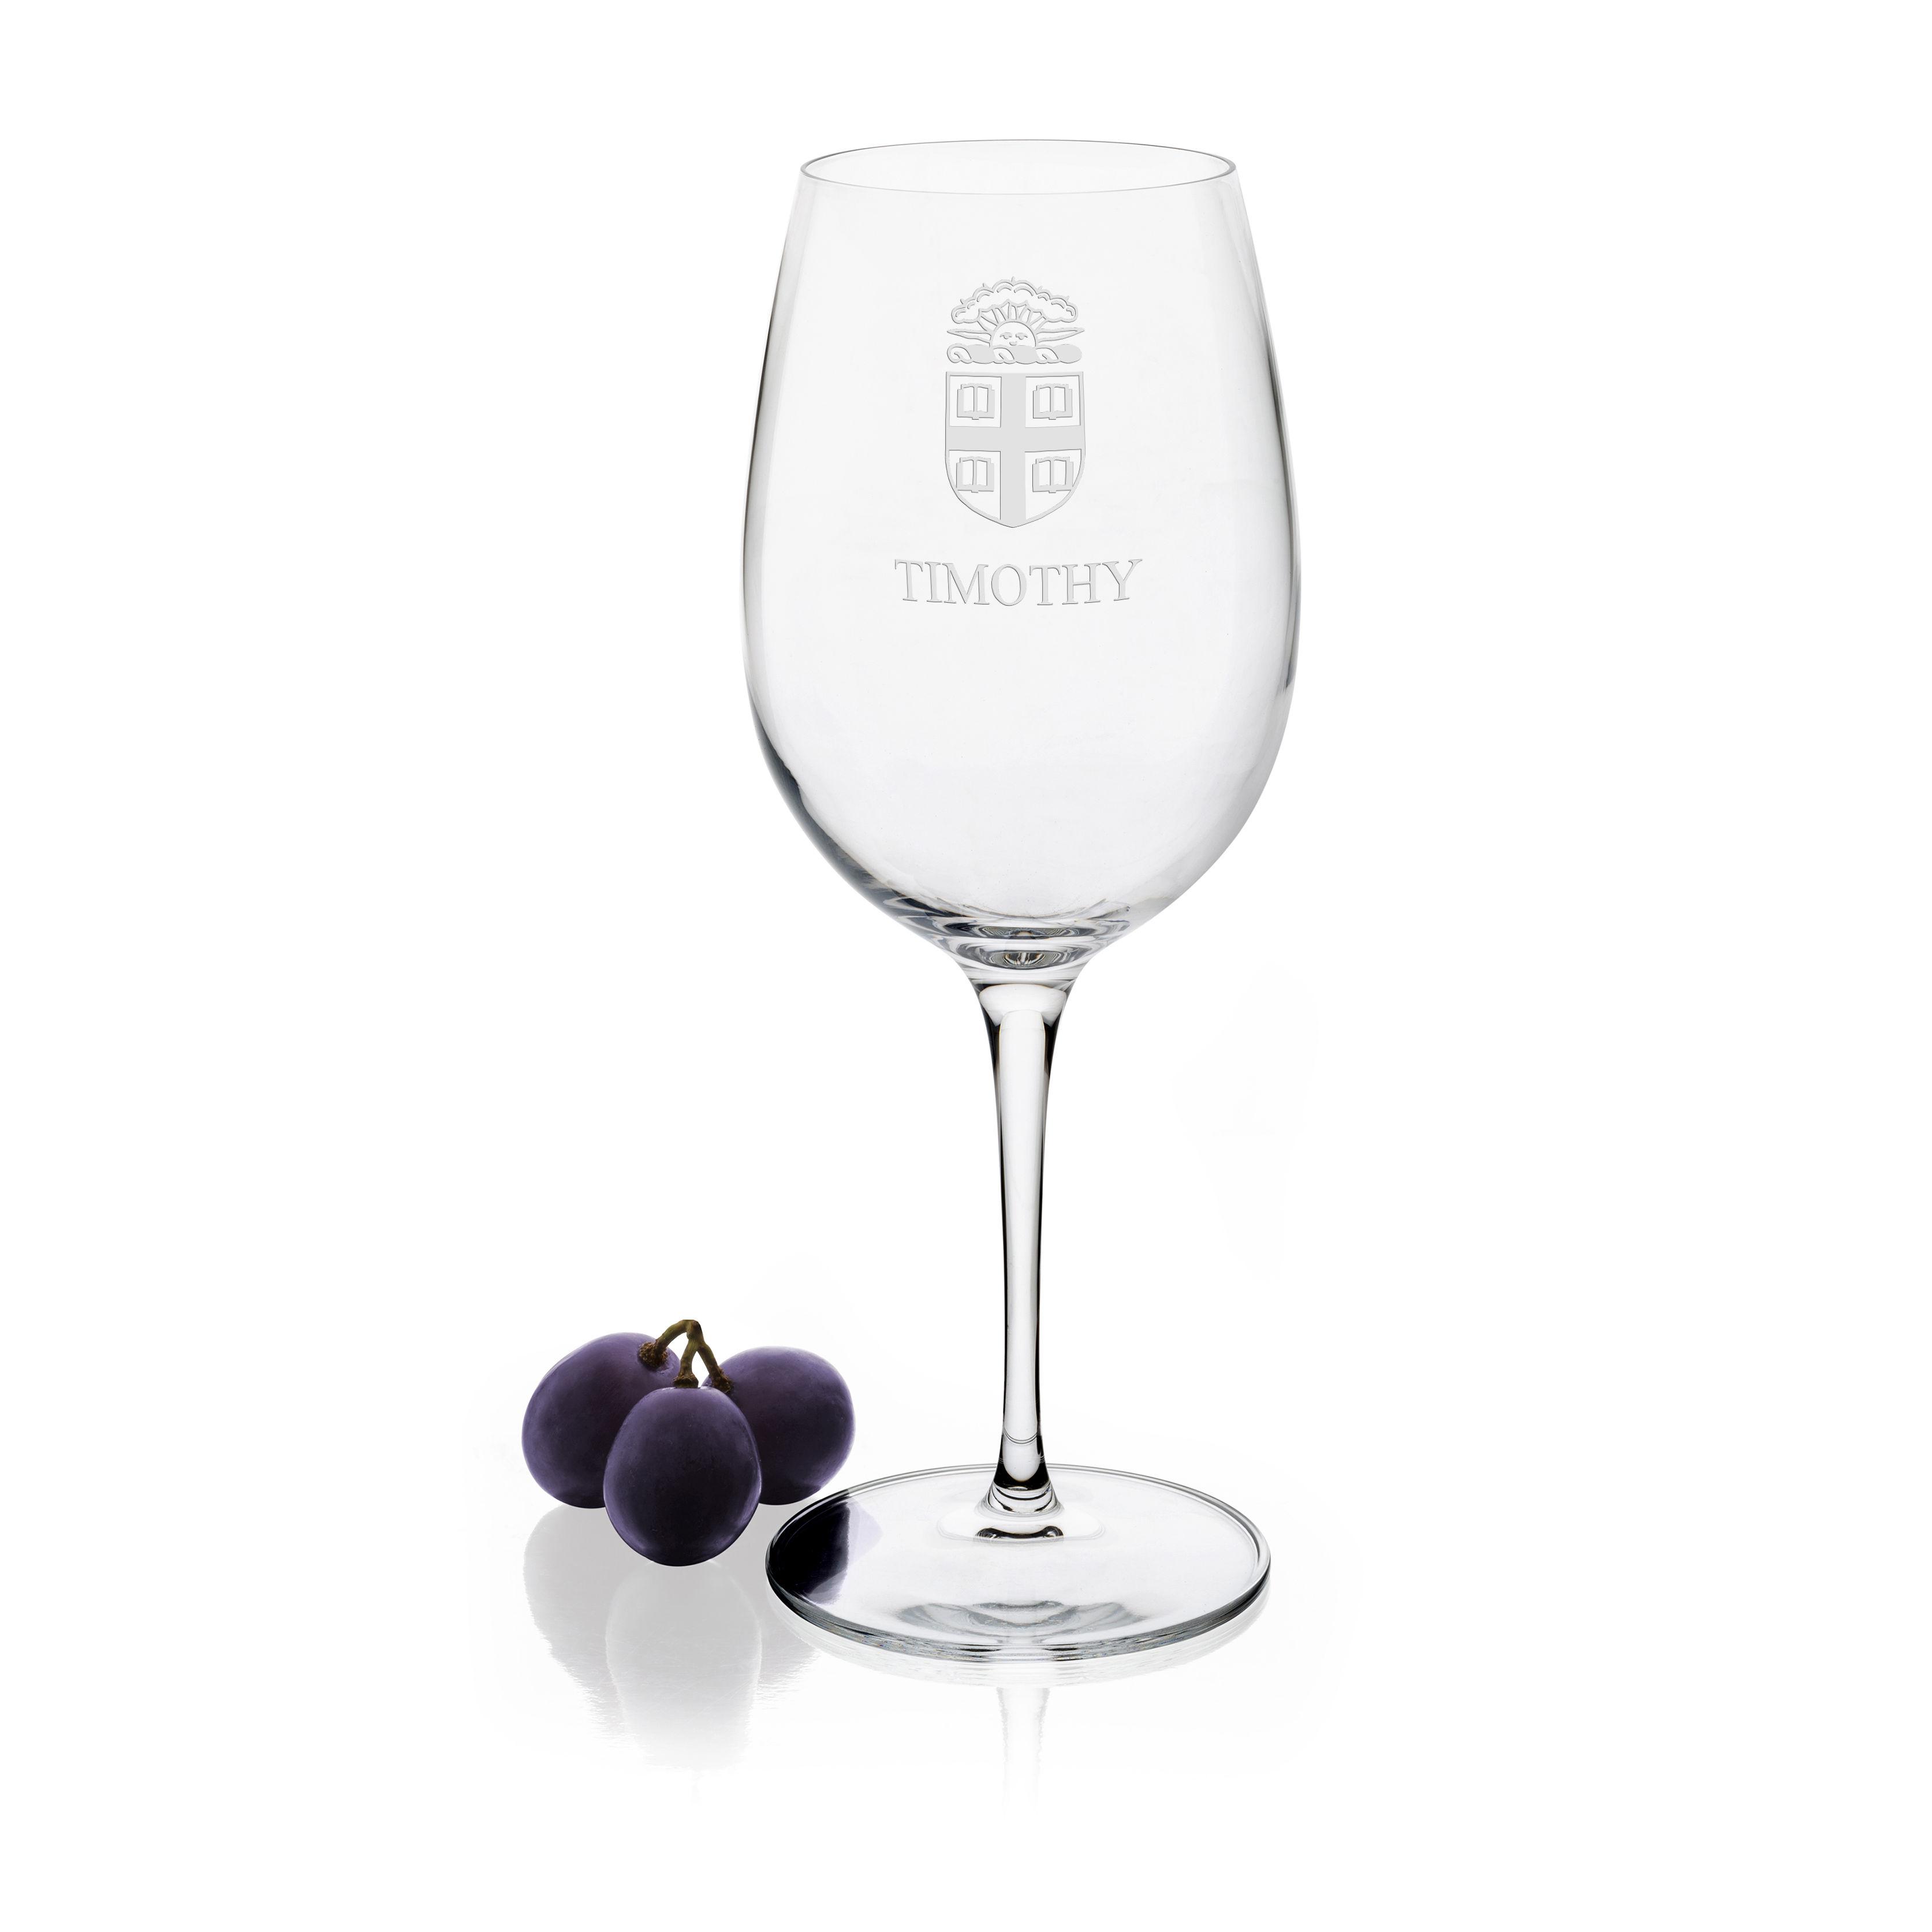 Brown University Red Wine Glasses - Set of 2